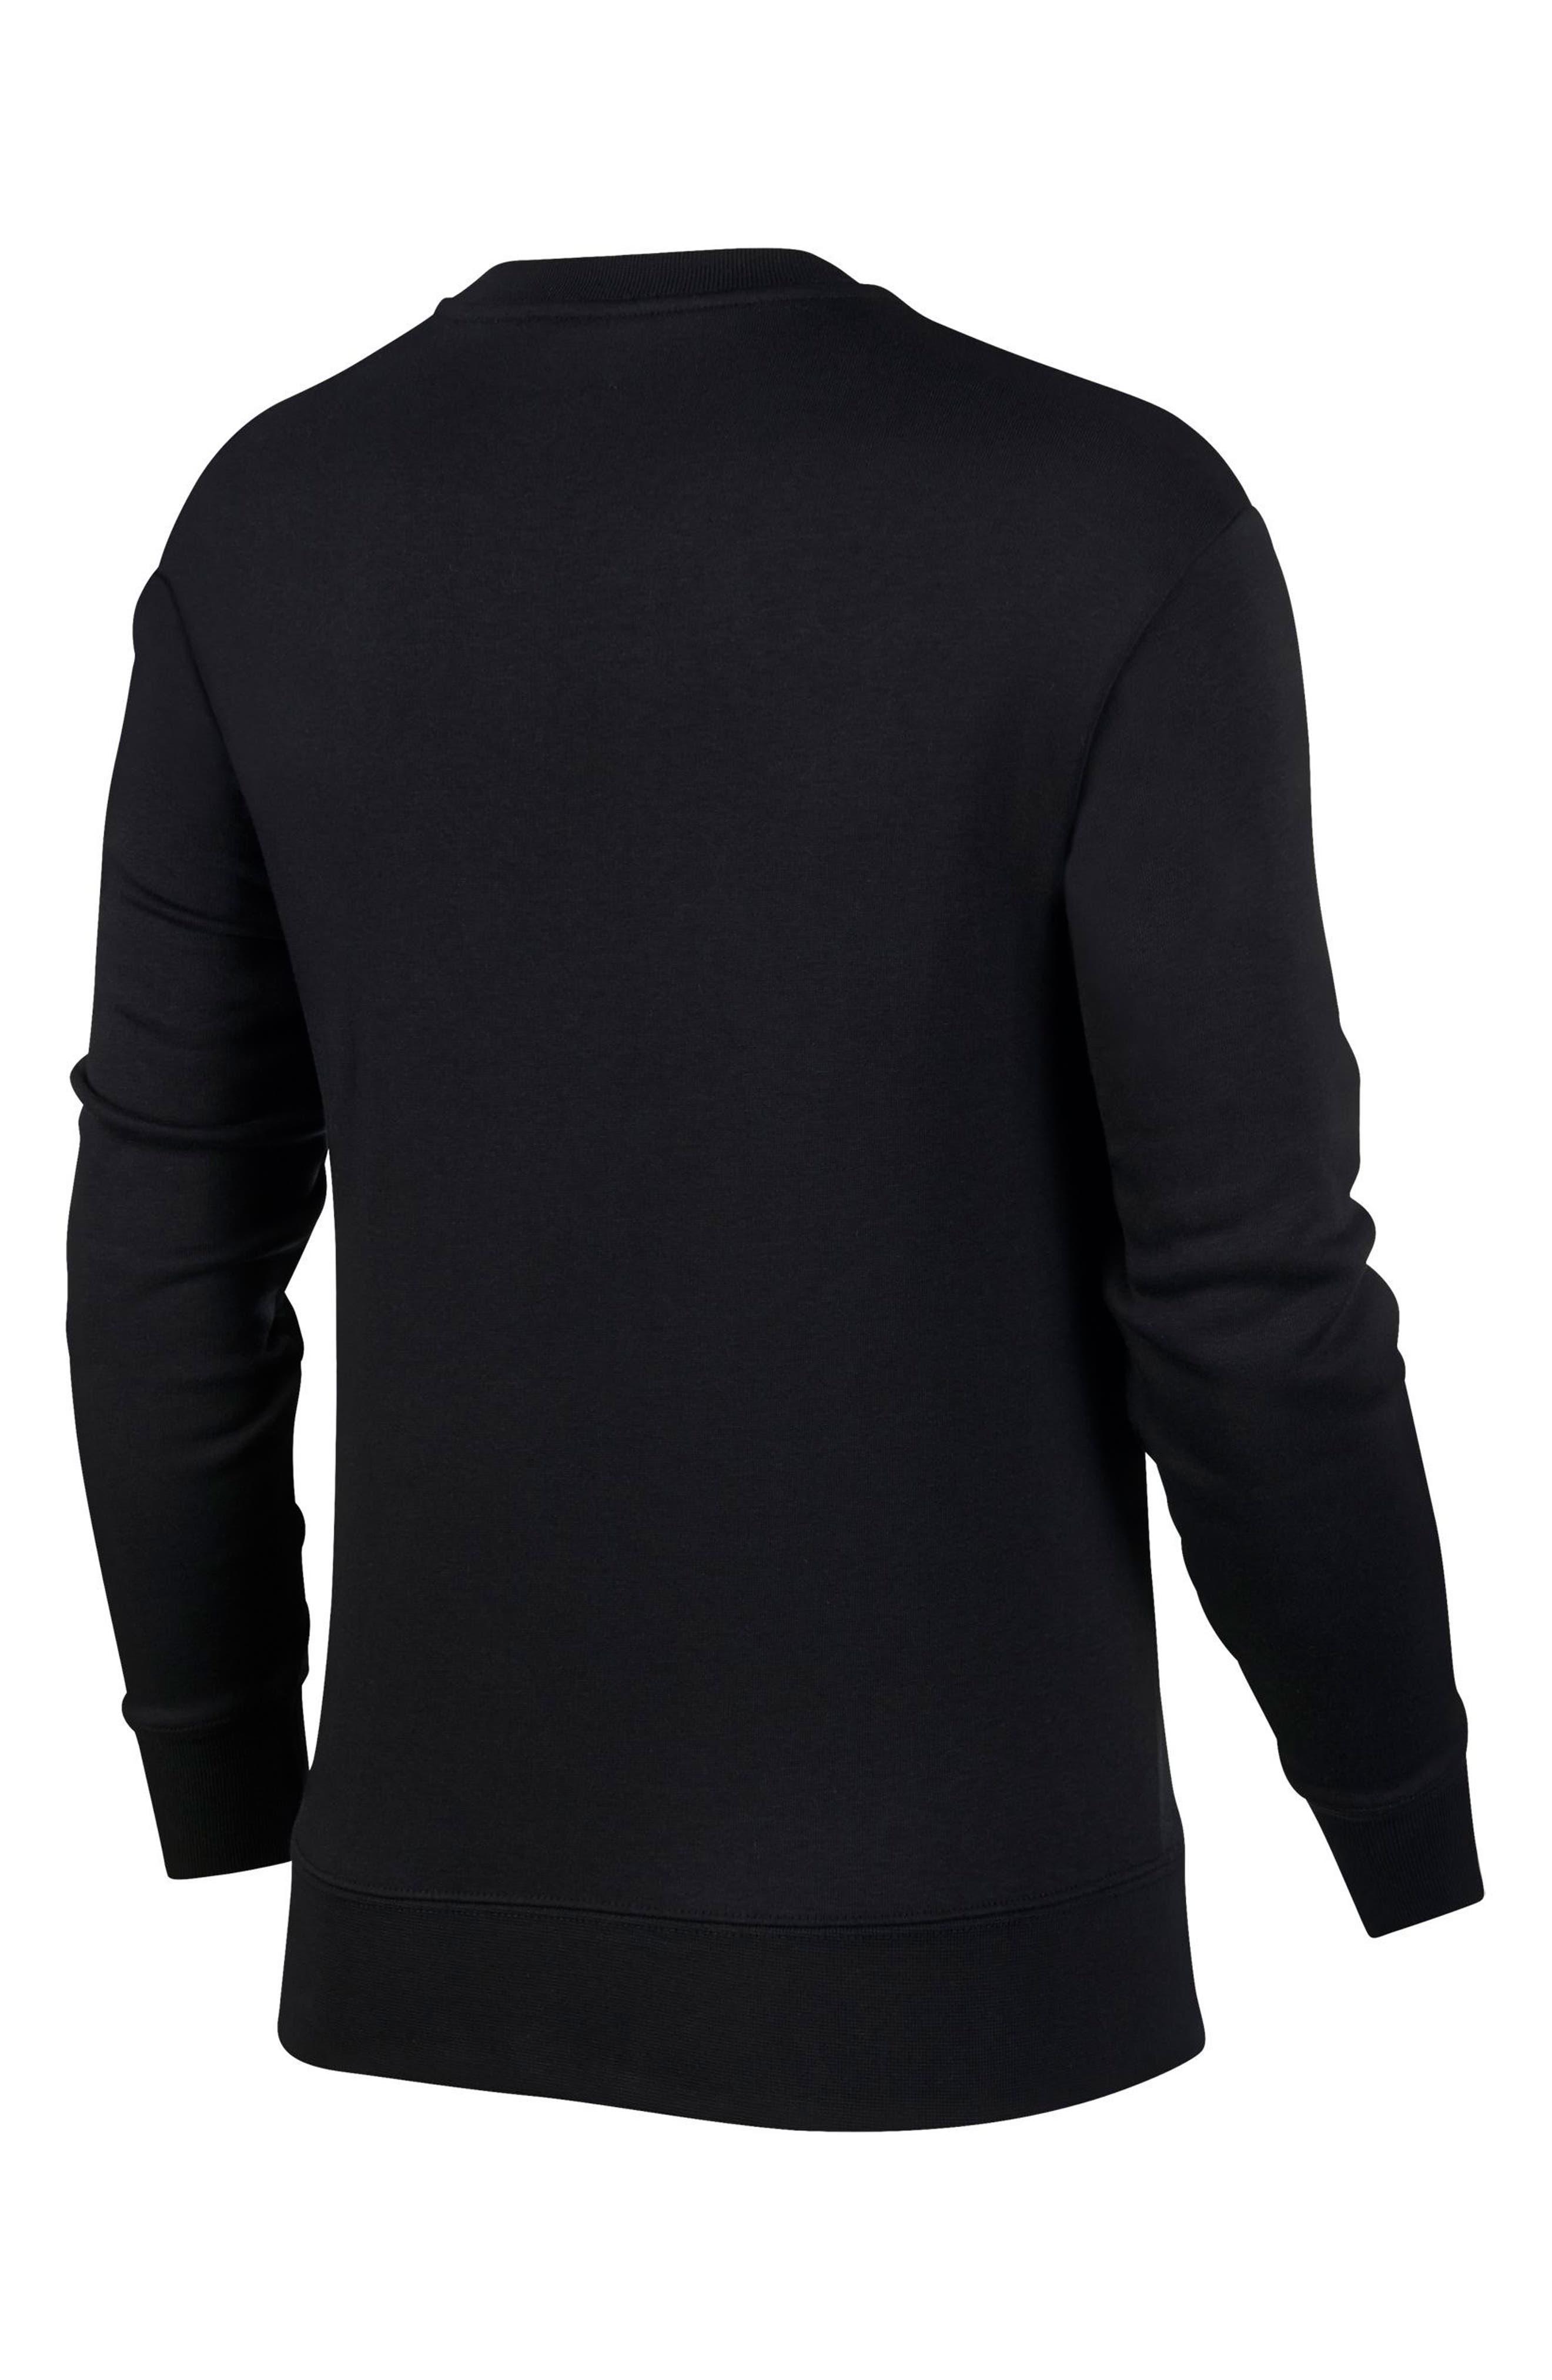 Sportswear Air Max 1 Women's Graphic Crewneck Sweatshirt,                             Alternate thumbnail 2, color,                             001